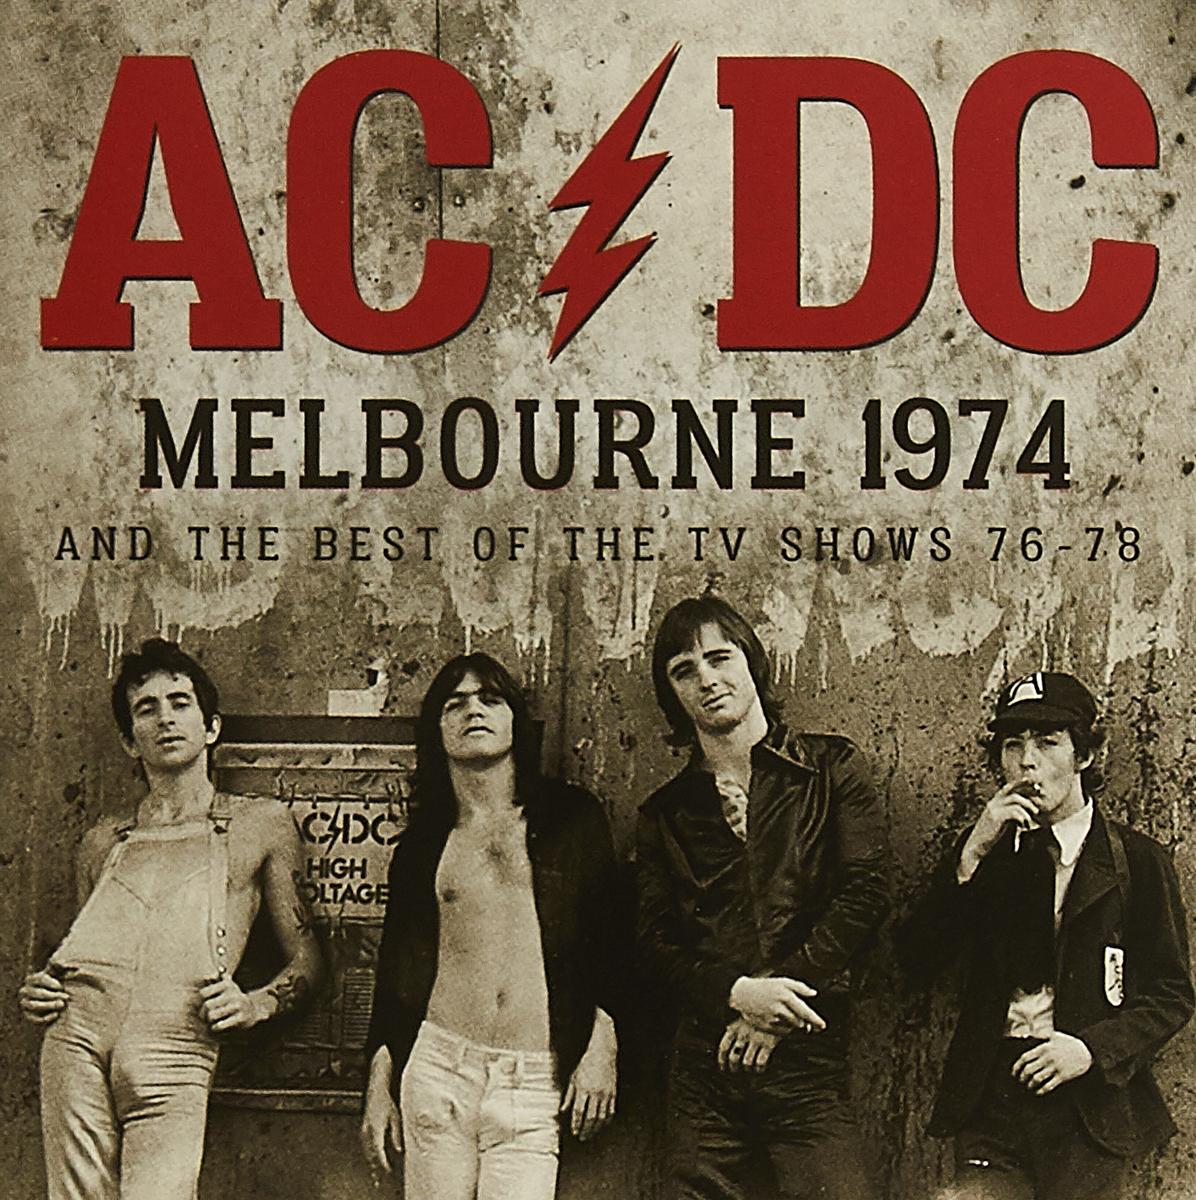 AC/DC AC/DC. Melbourne 1974 train melbourne